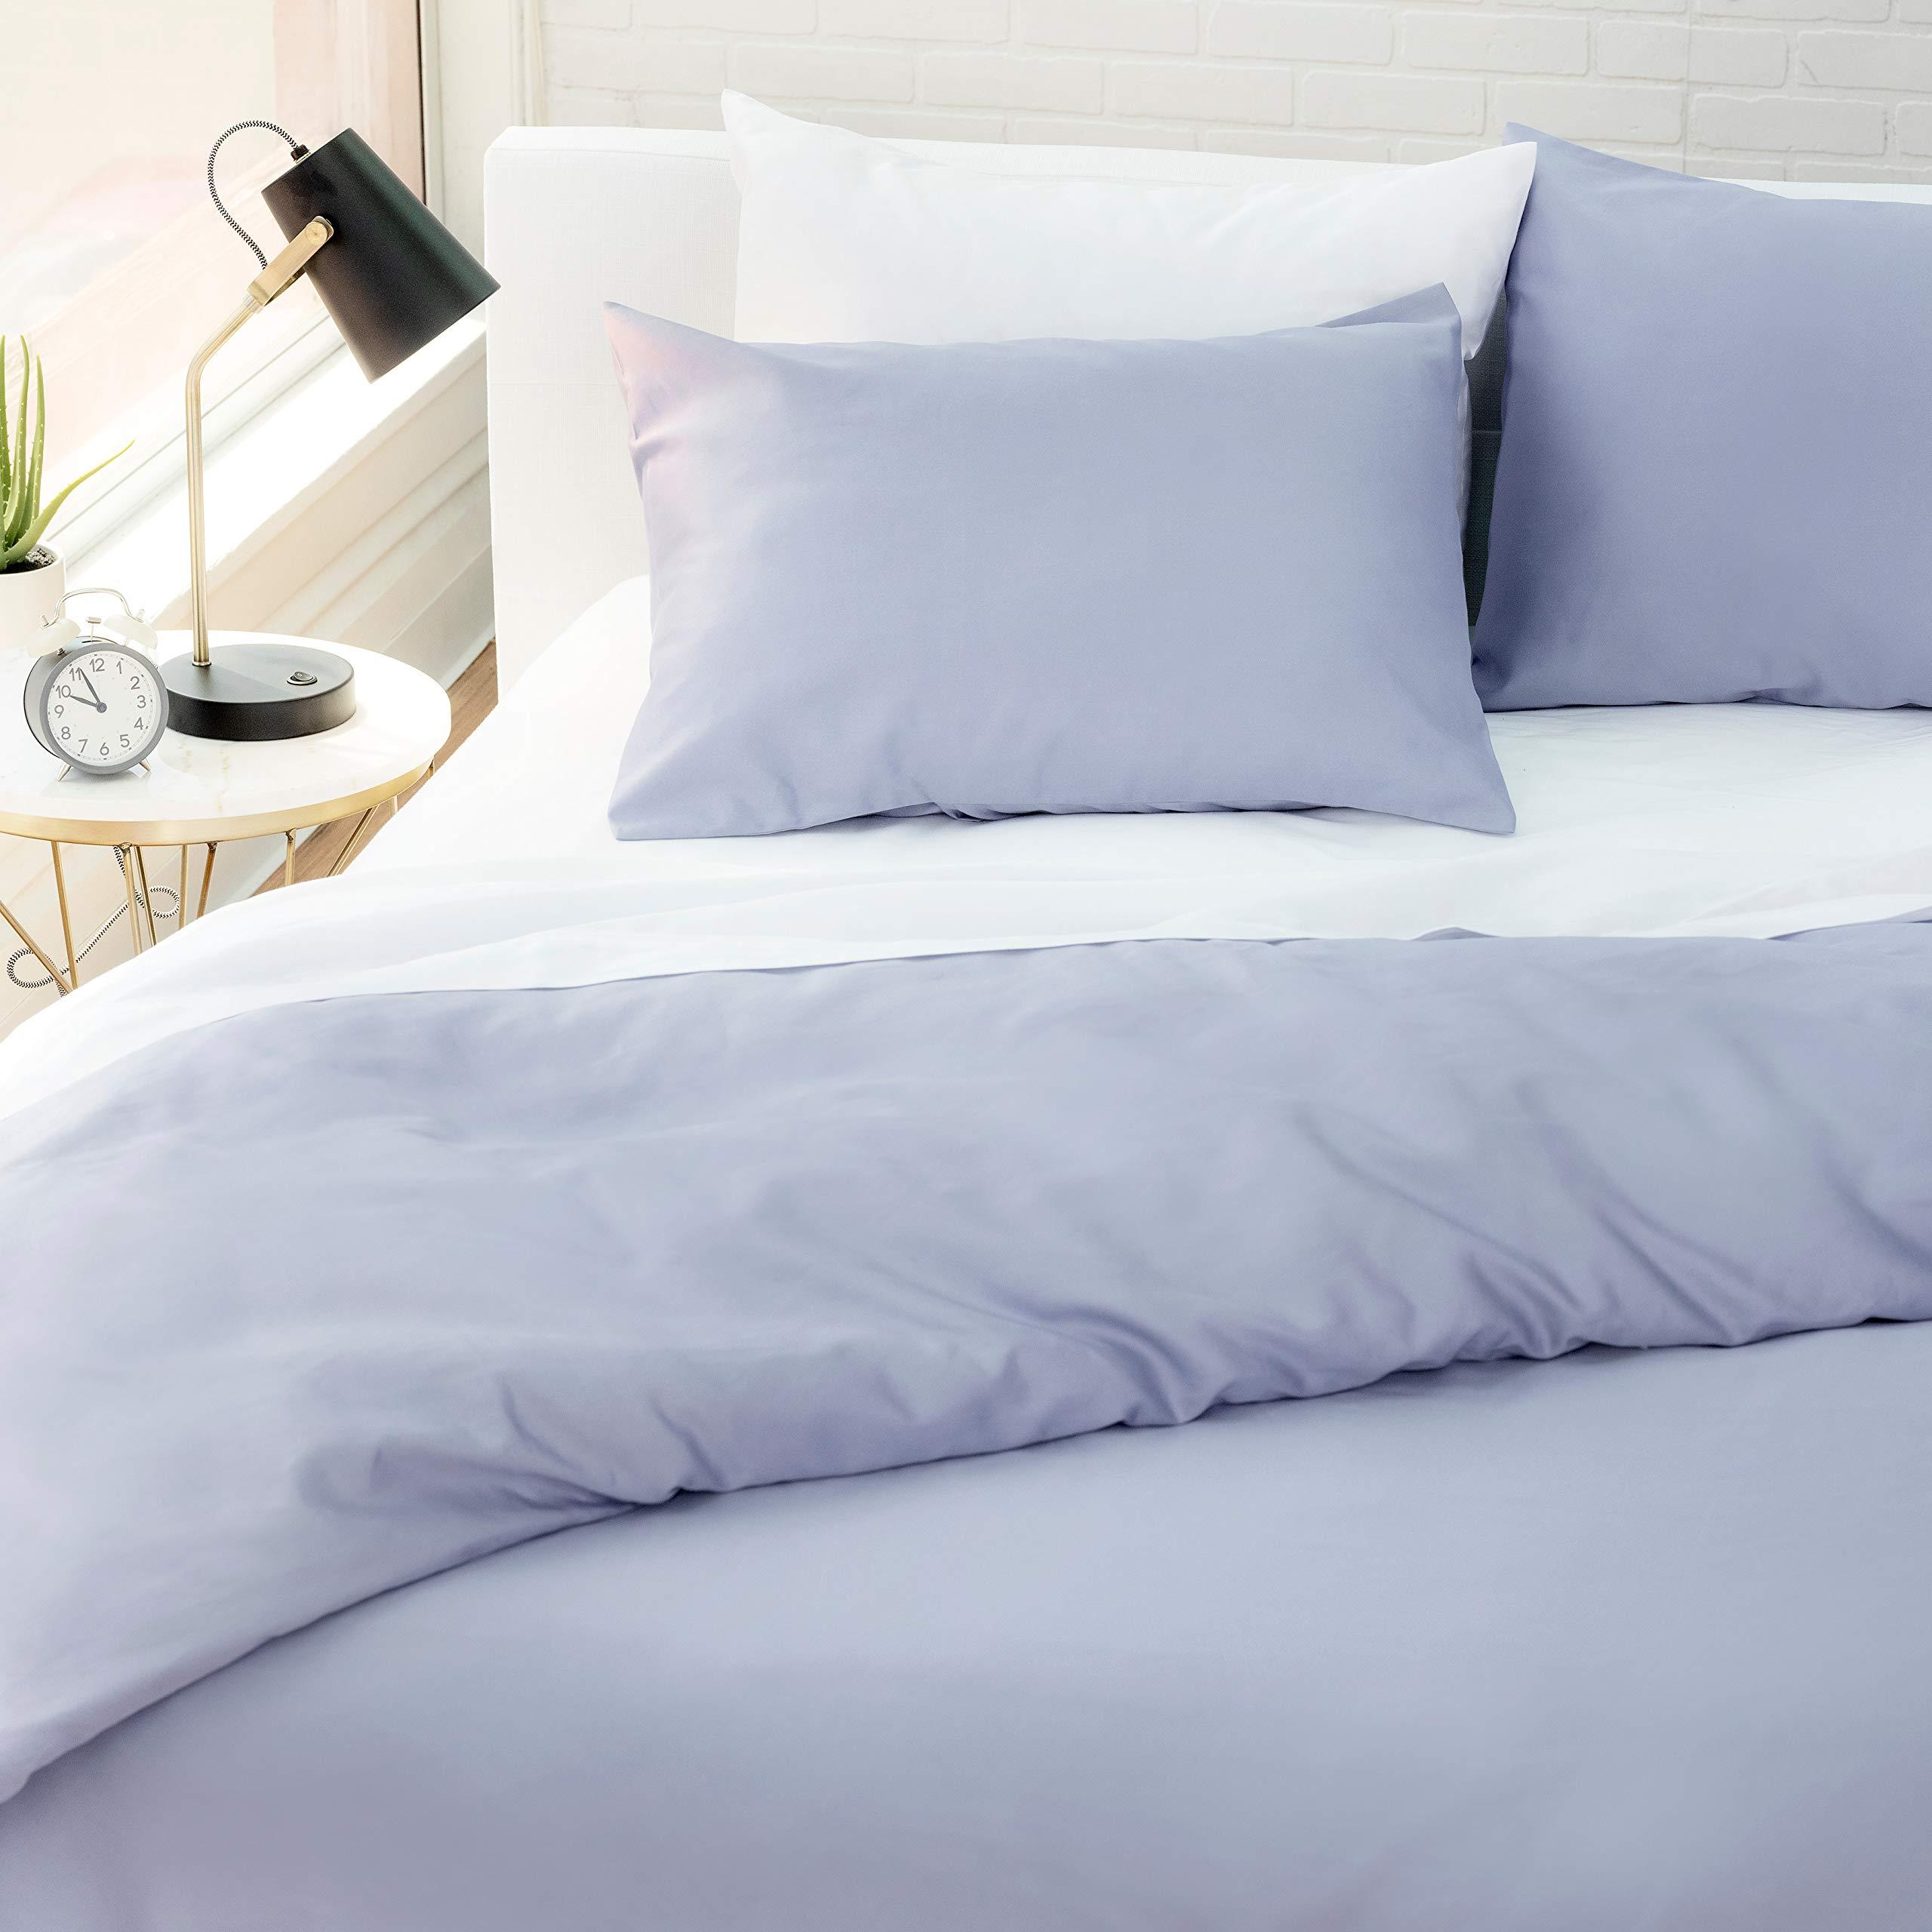 "Welhome Kensington 100% Cotton Sateen Duvet Set - King Size - 108""x 92"" - Breathable - Smooth & Soft - Durable - Machine Washable - Cornflower"